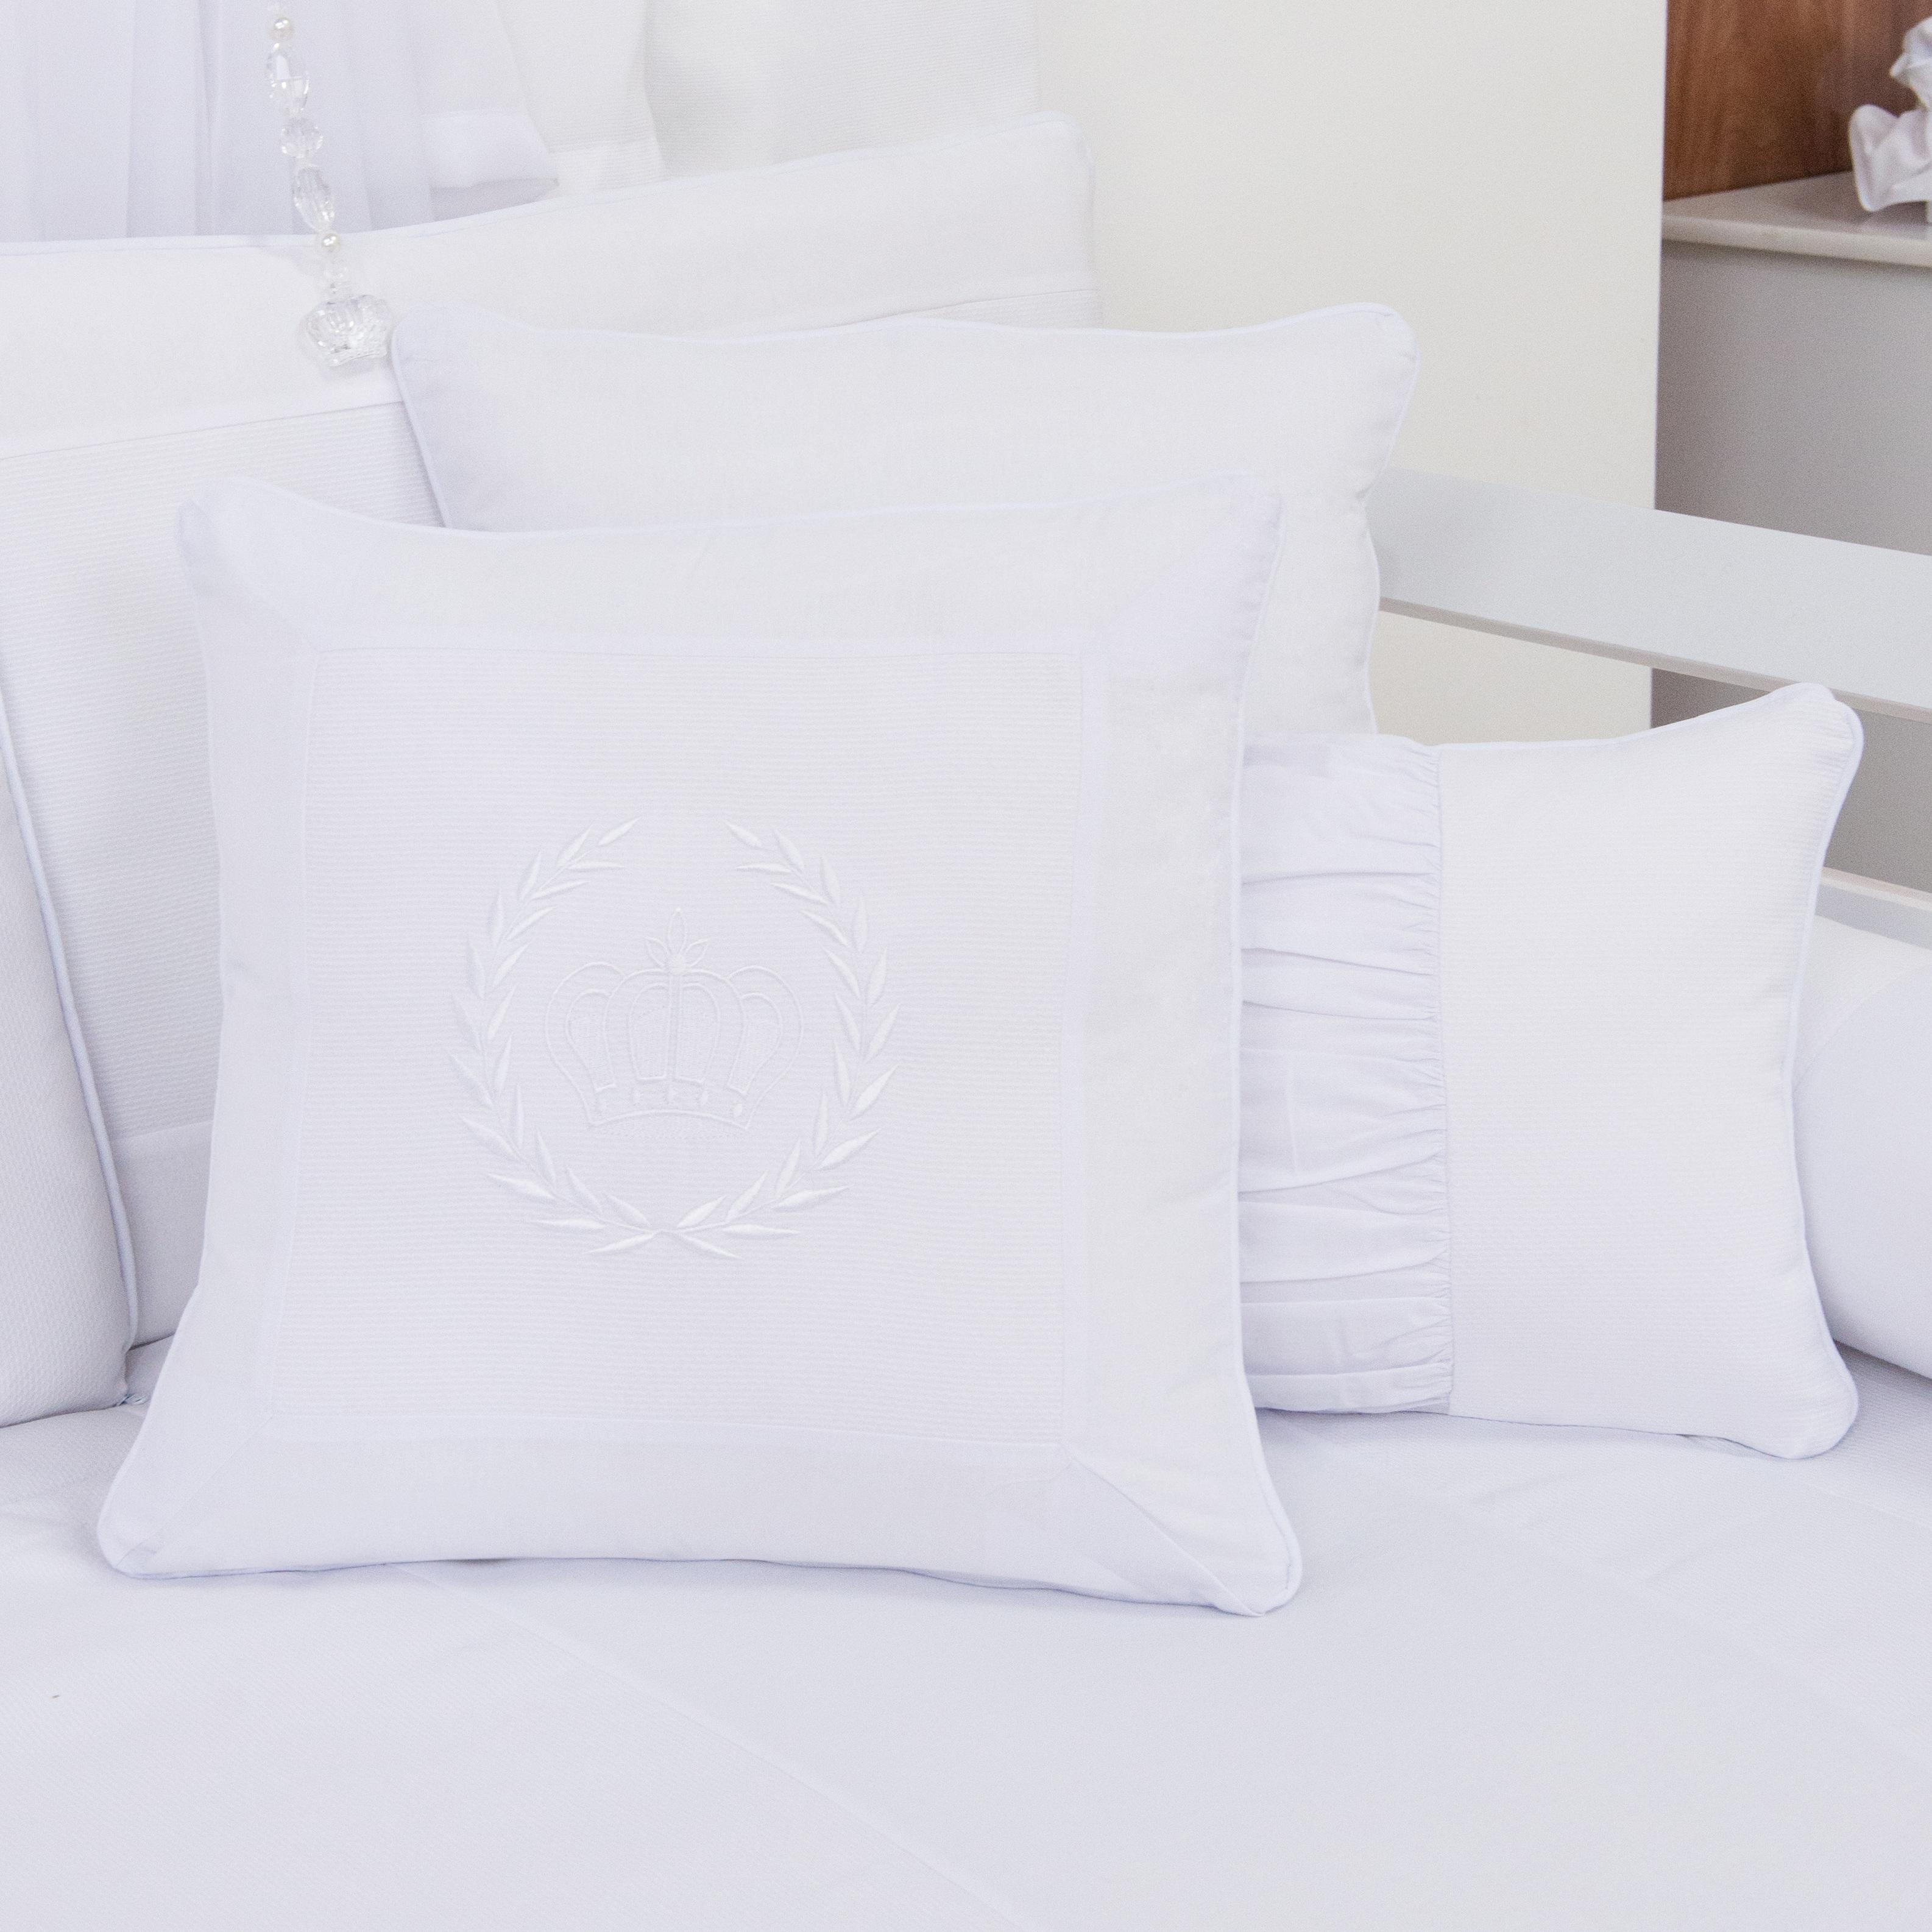 Almofadas Decorativas Realeza Branco